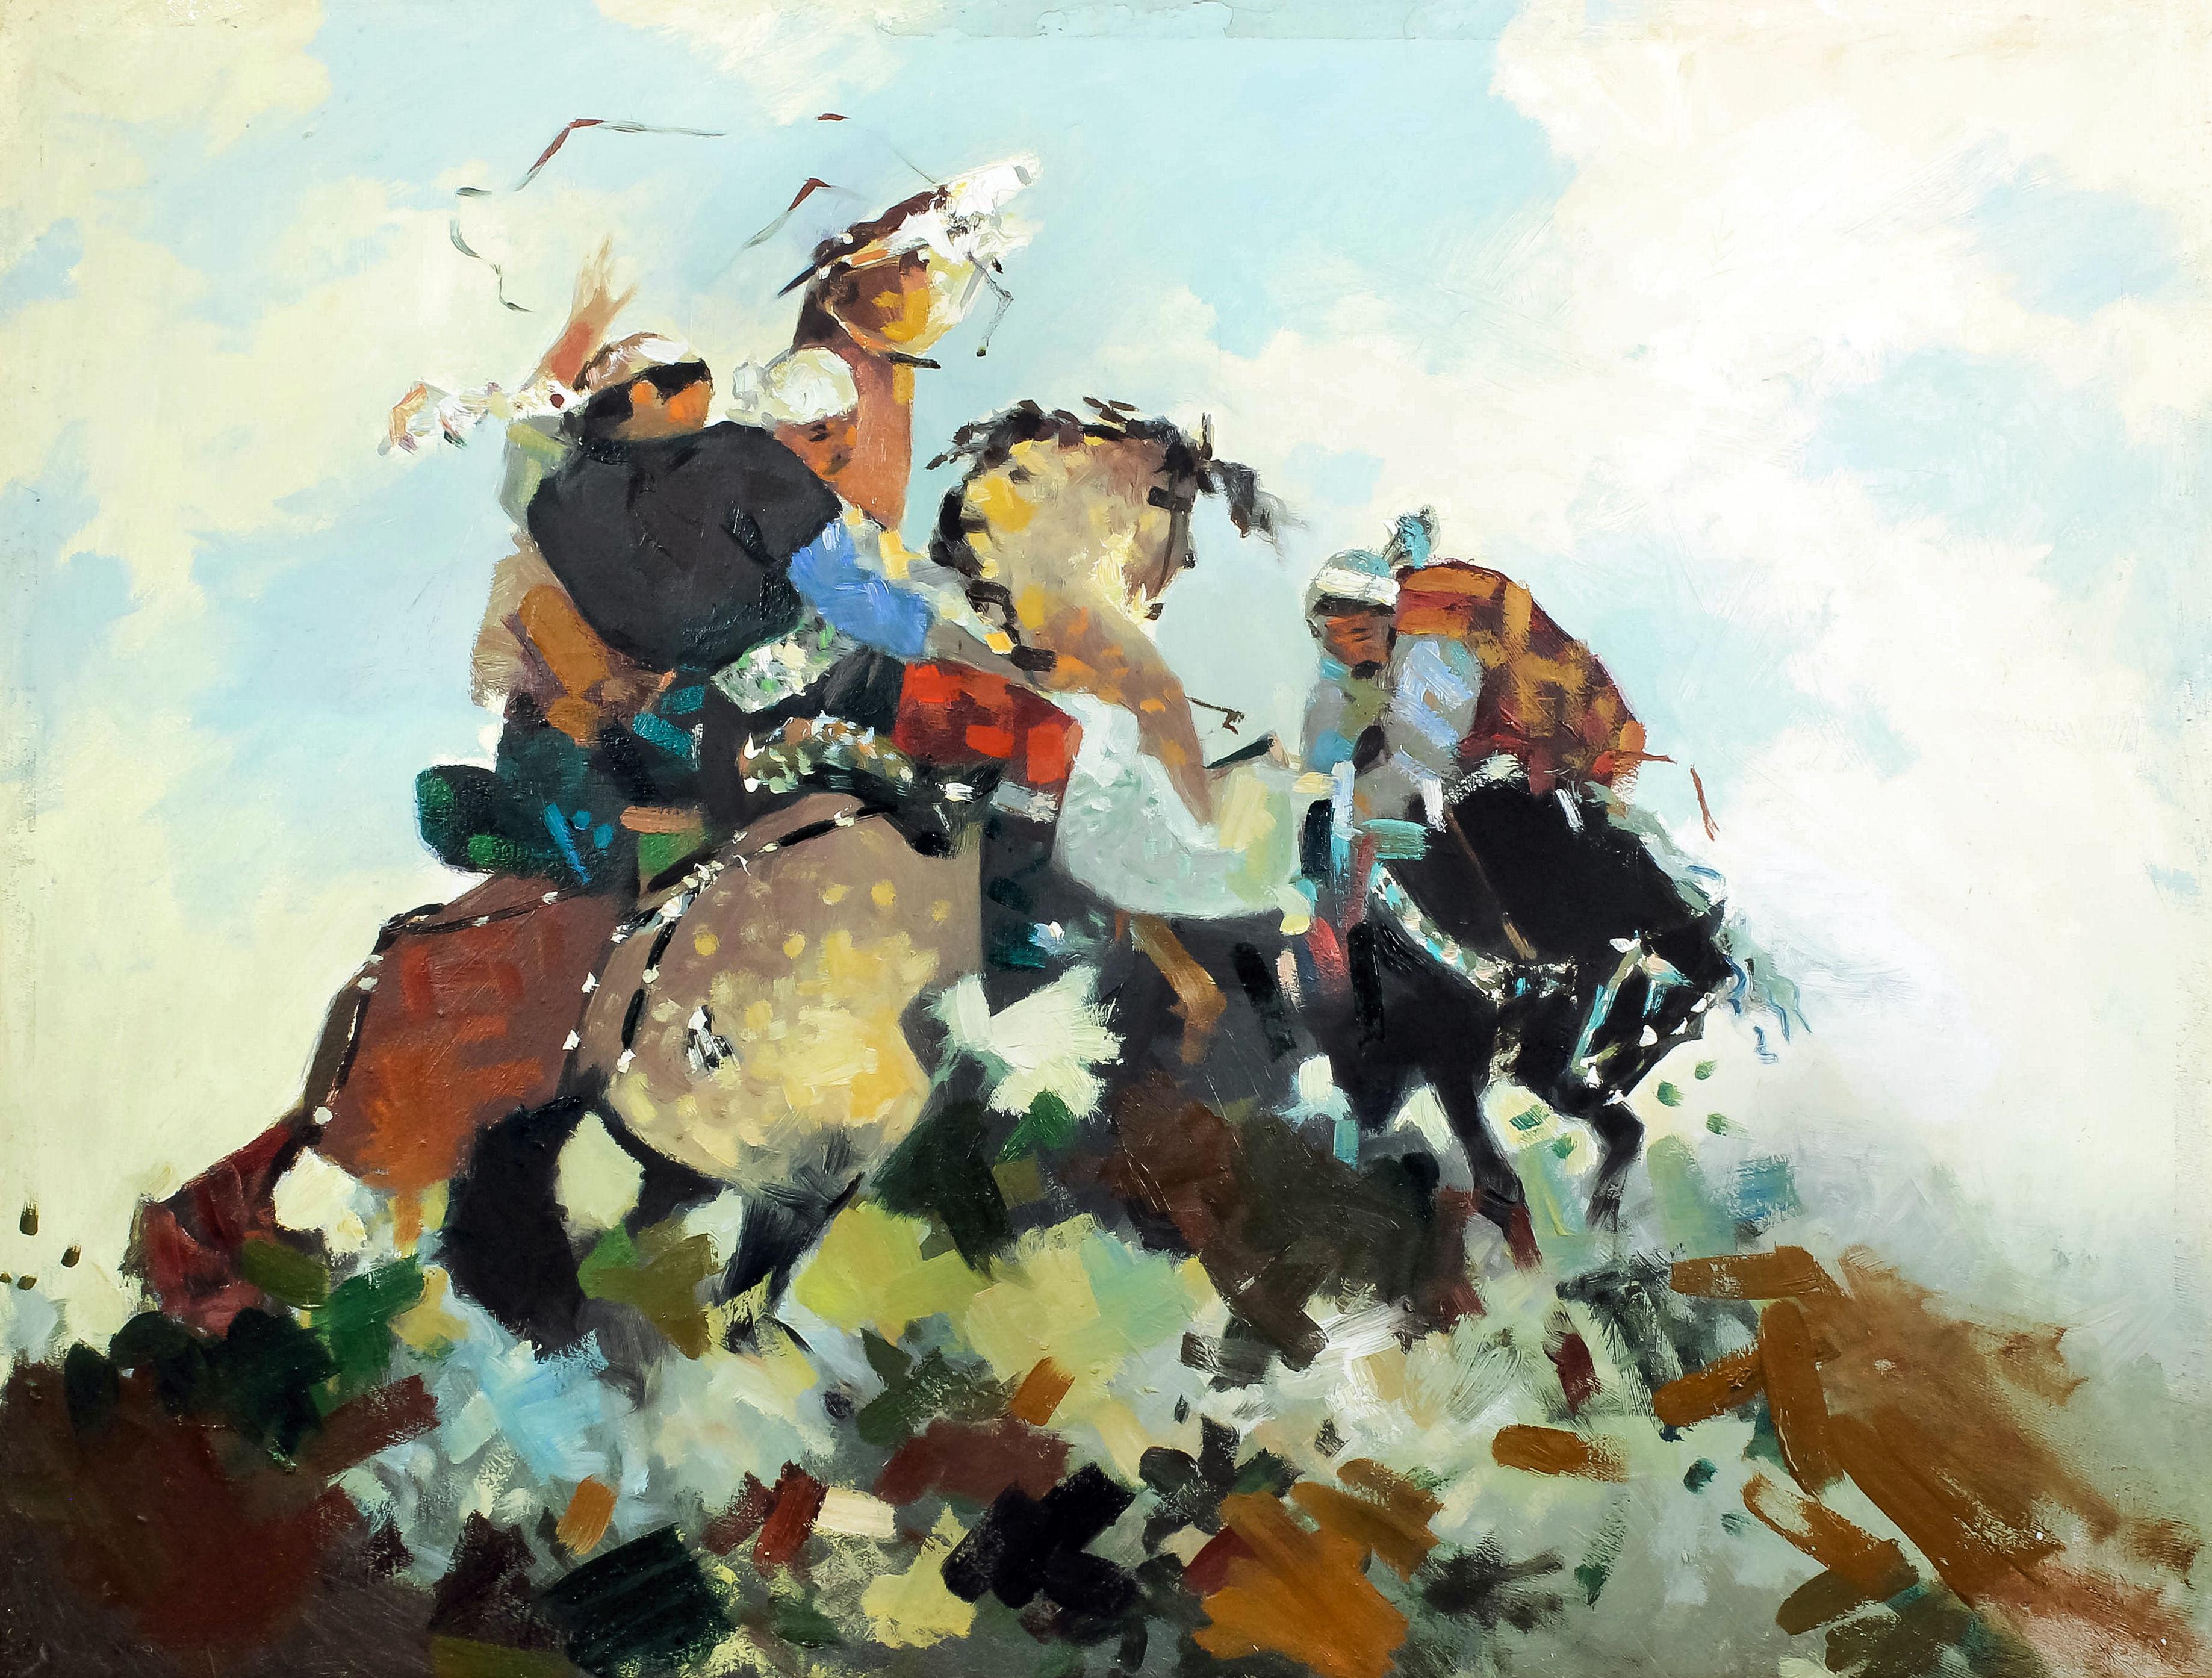 20th Century Kazakhstan school - Oil painting - A nomadic